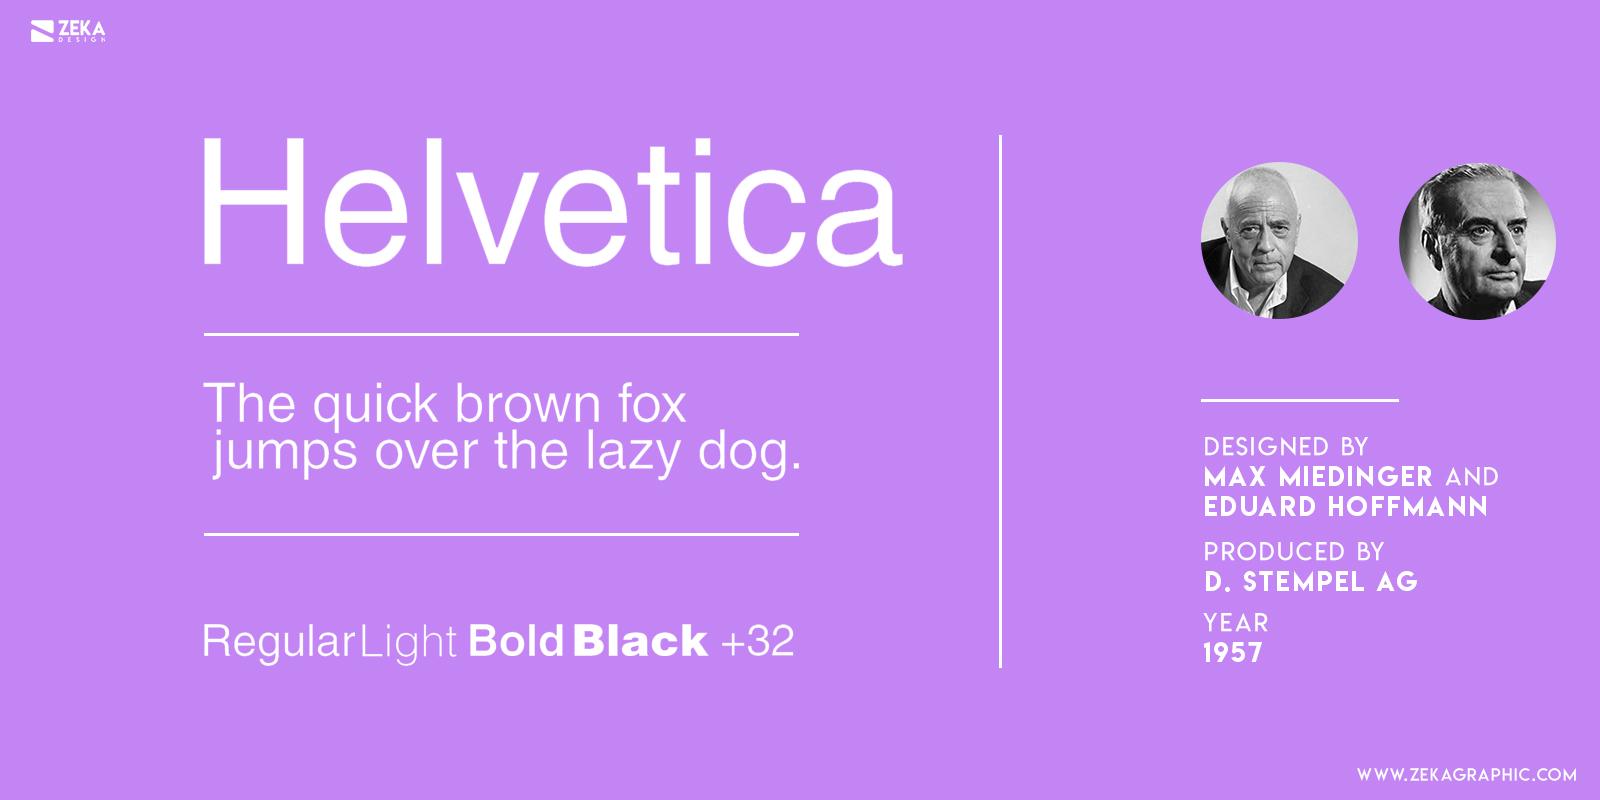 Helvetica Typography History 1950 Typefaces